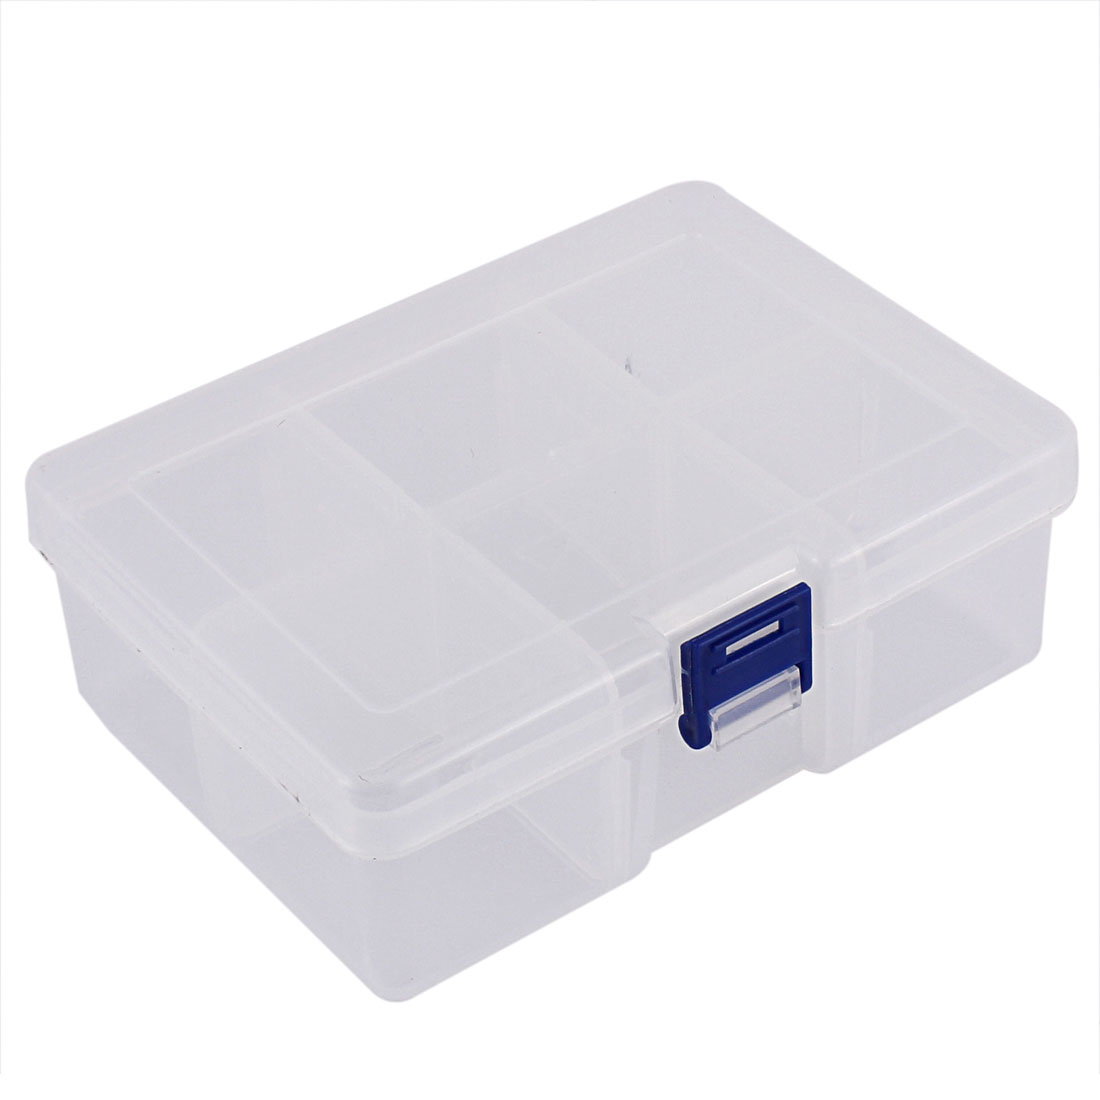 Jewelry Hardware Plastic 6 Slots Storage Case Box Organizer Conatiner Clear